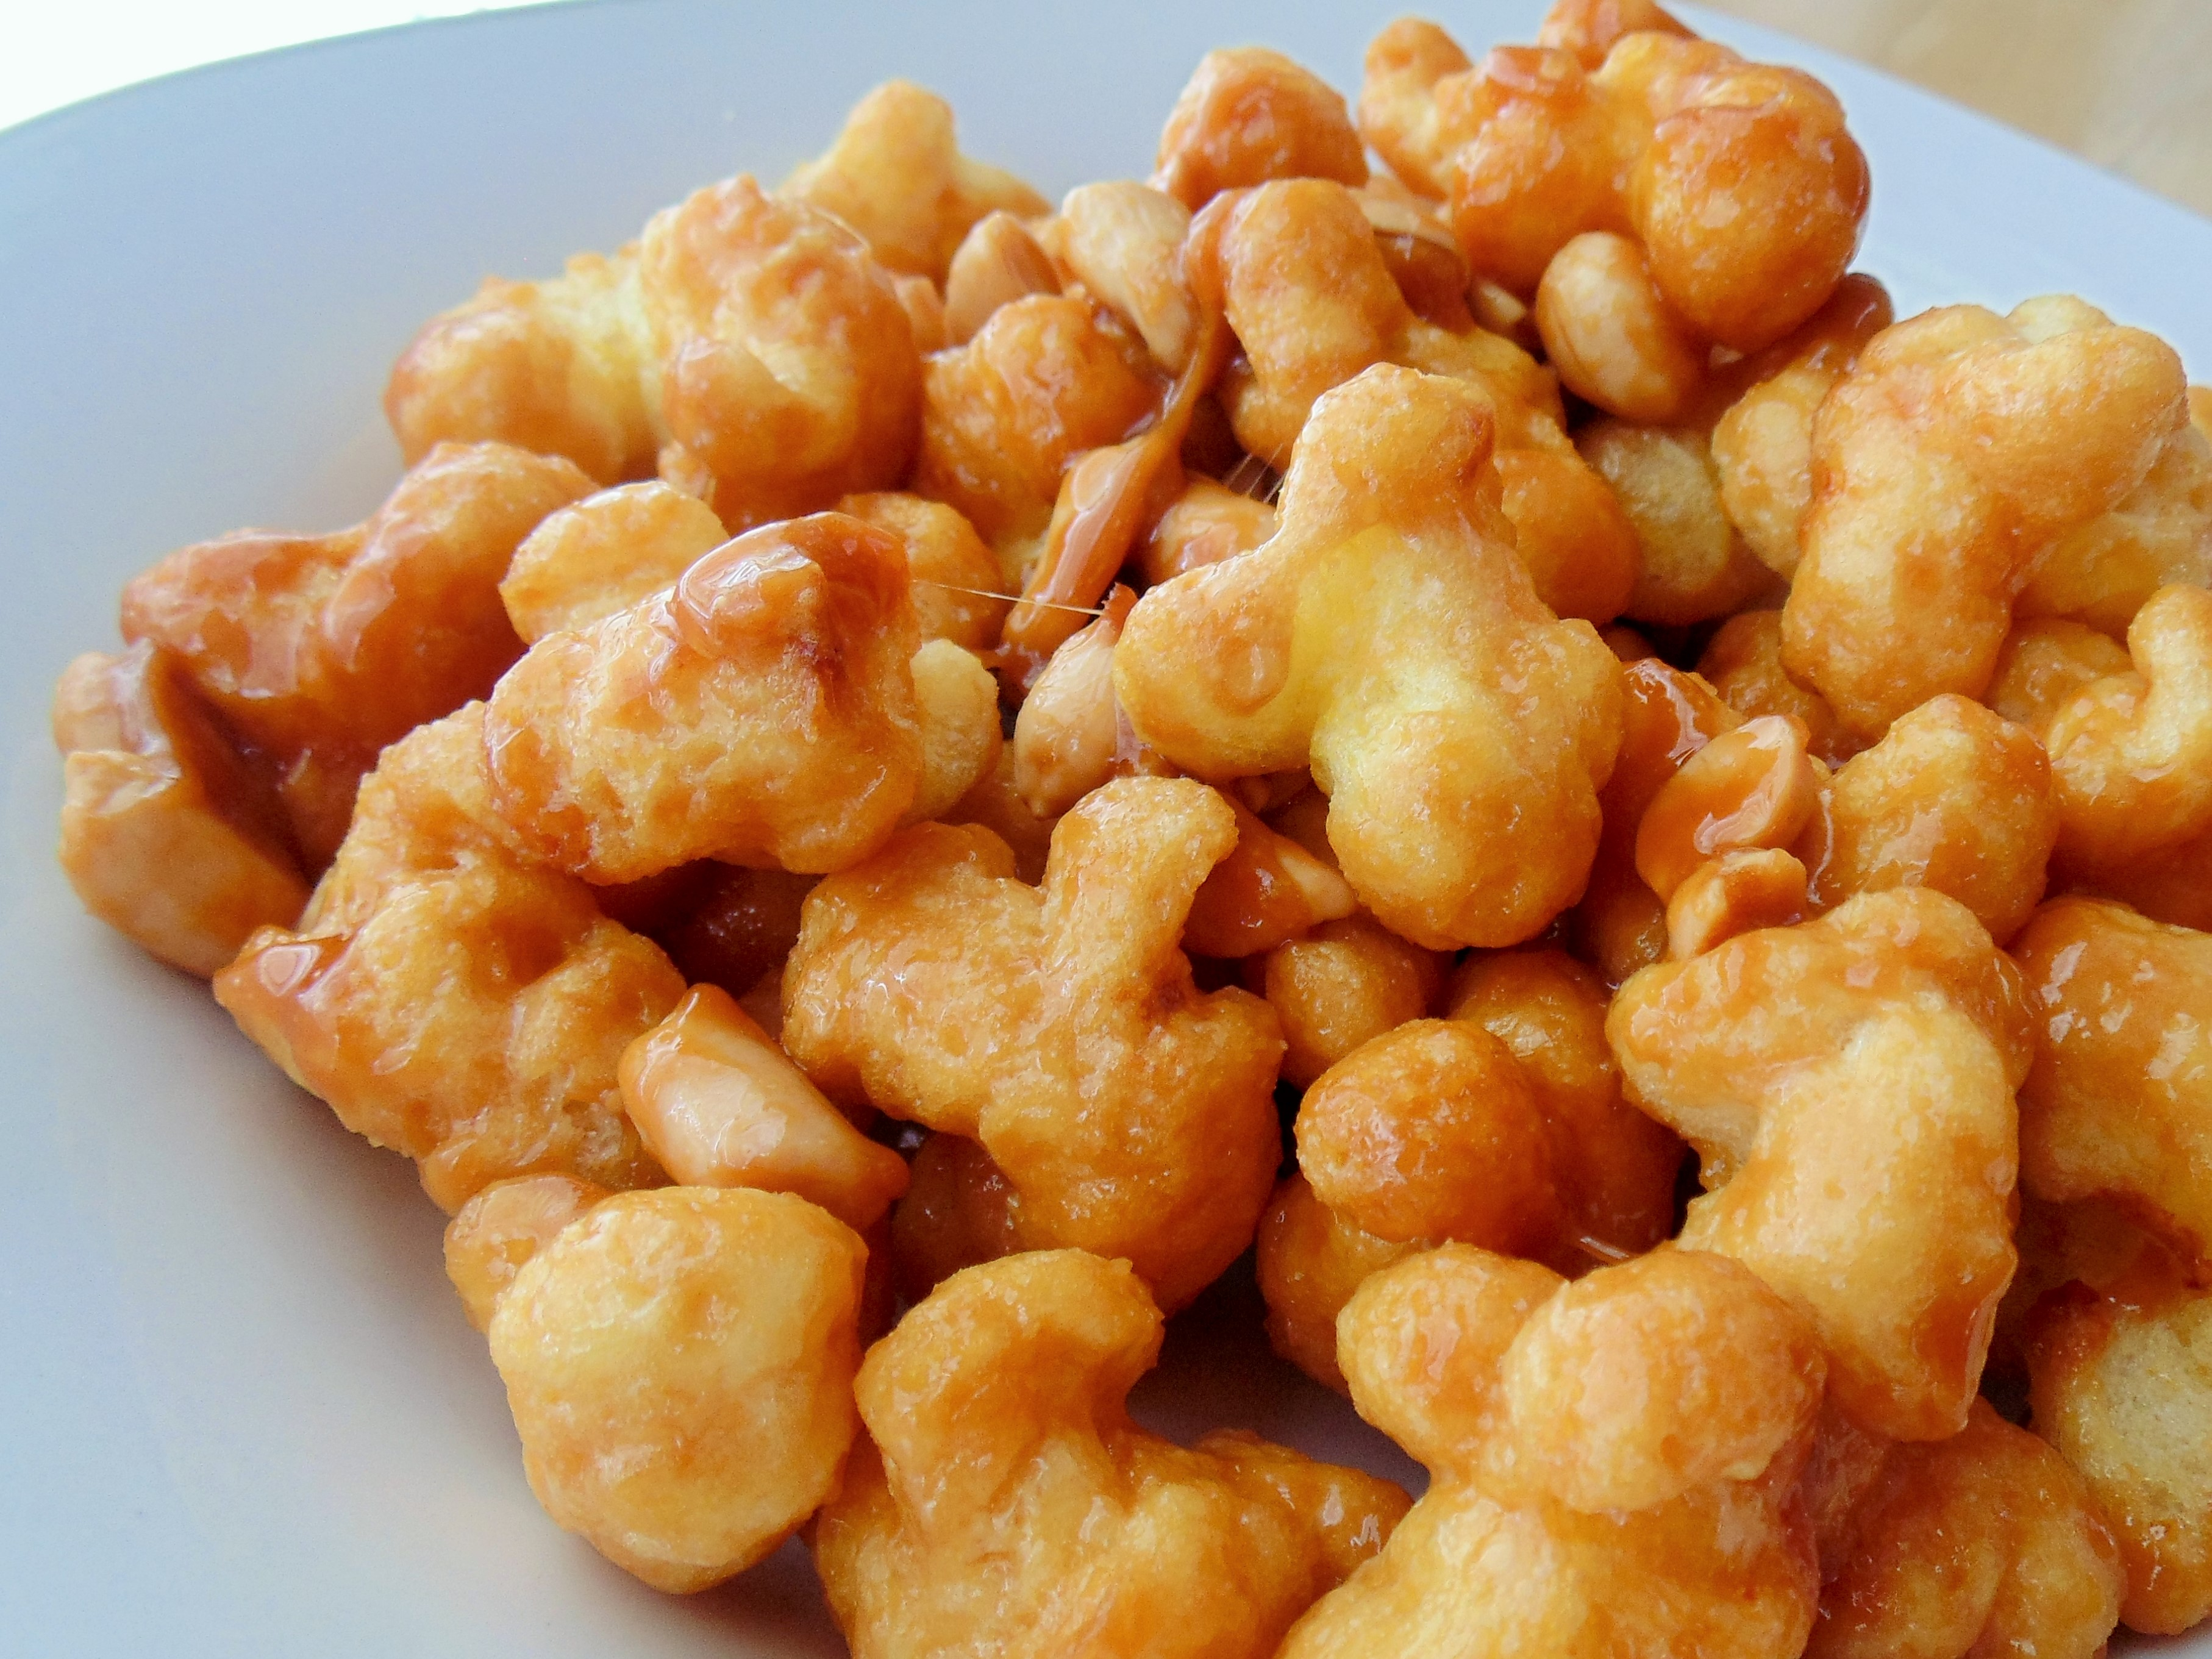 Puffed Caramel Corn